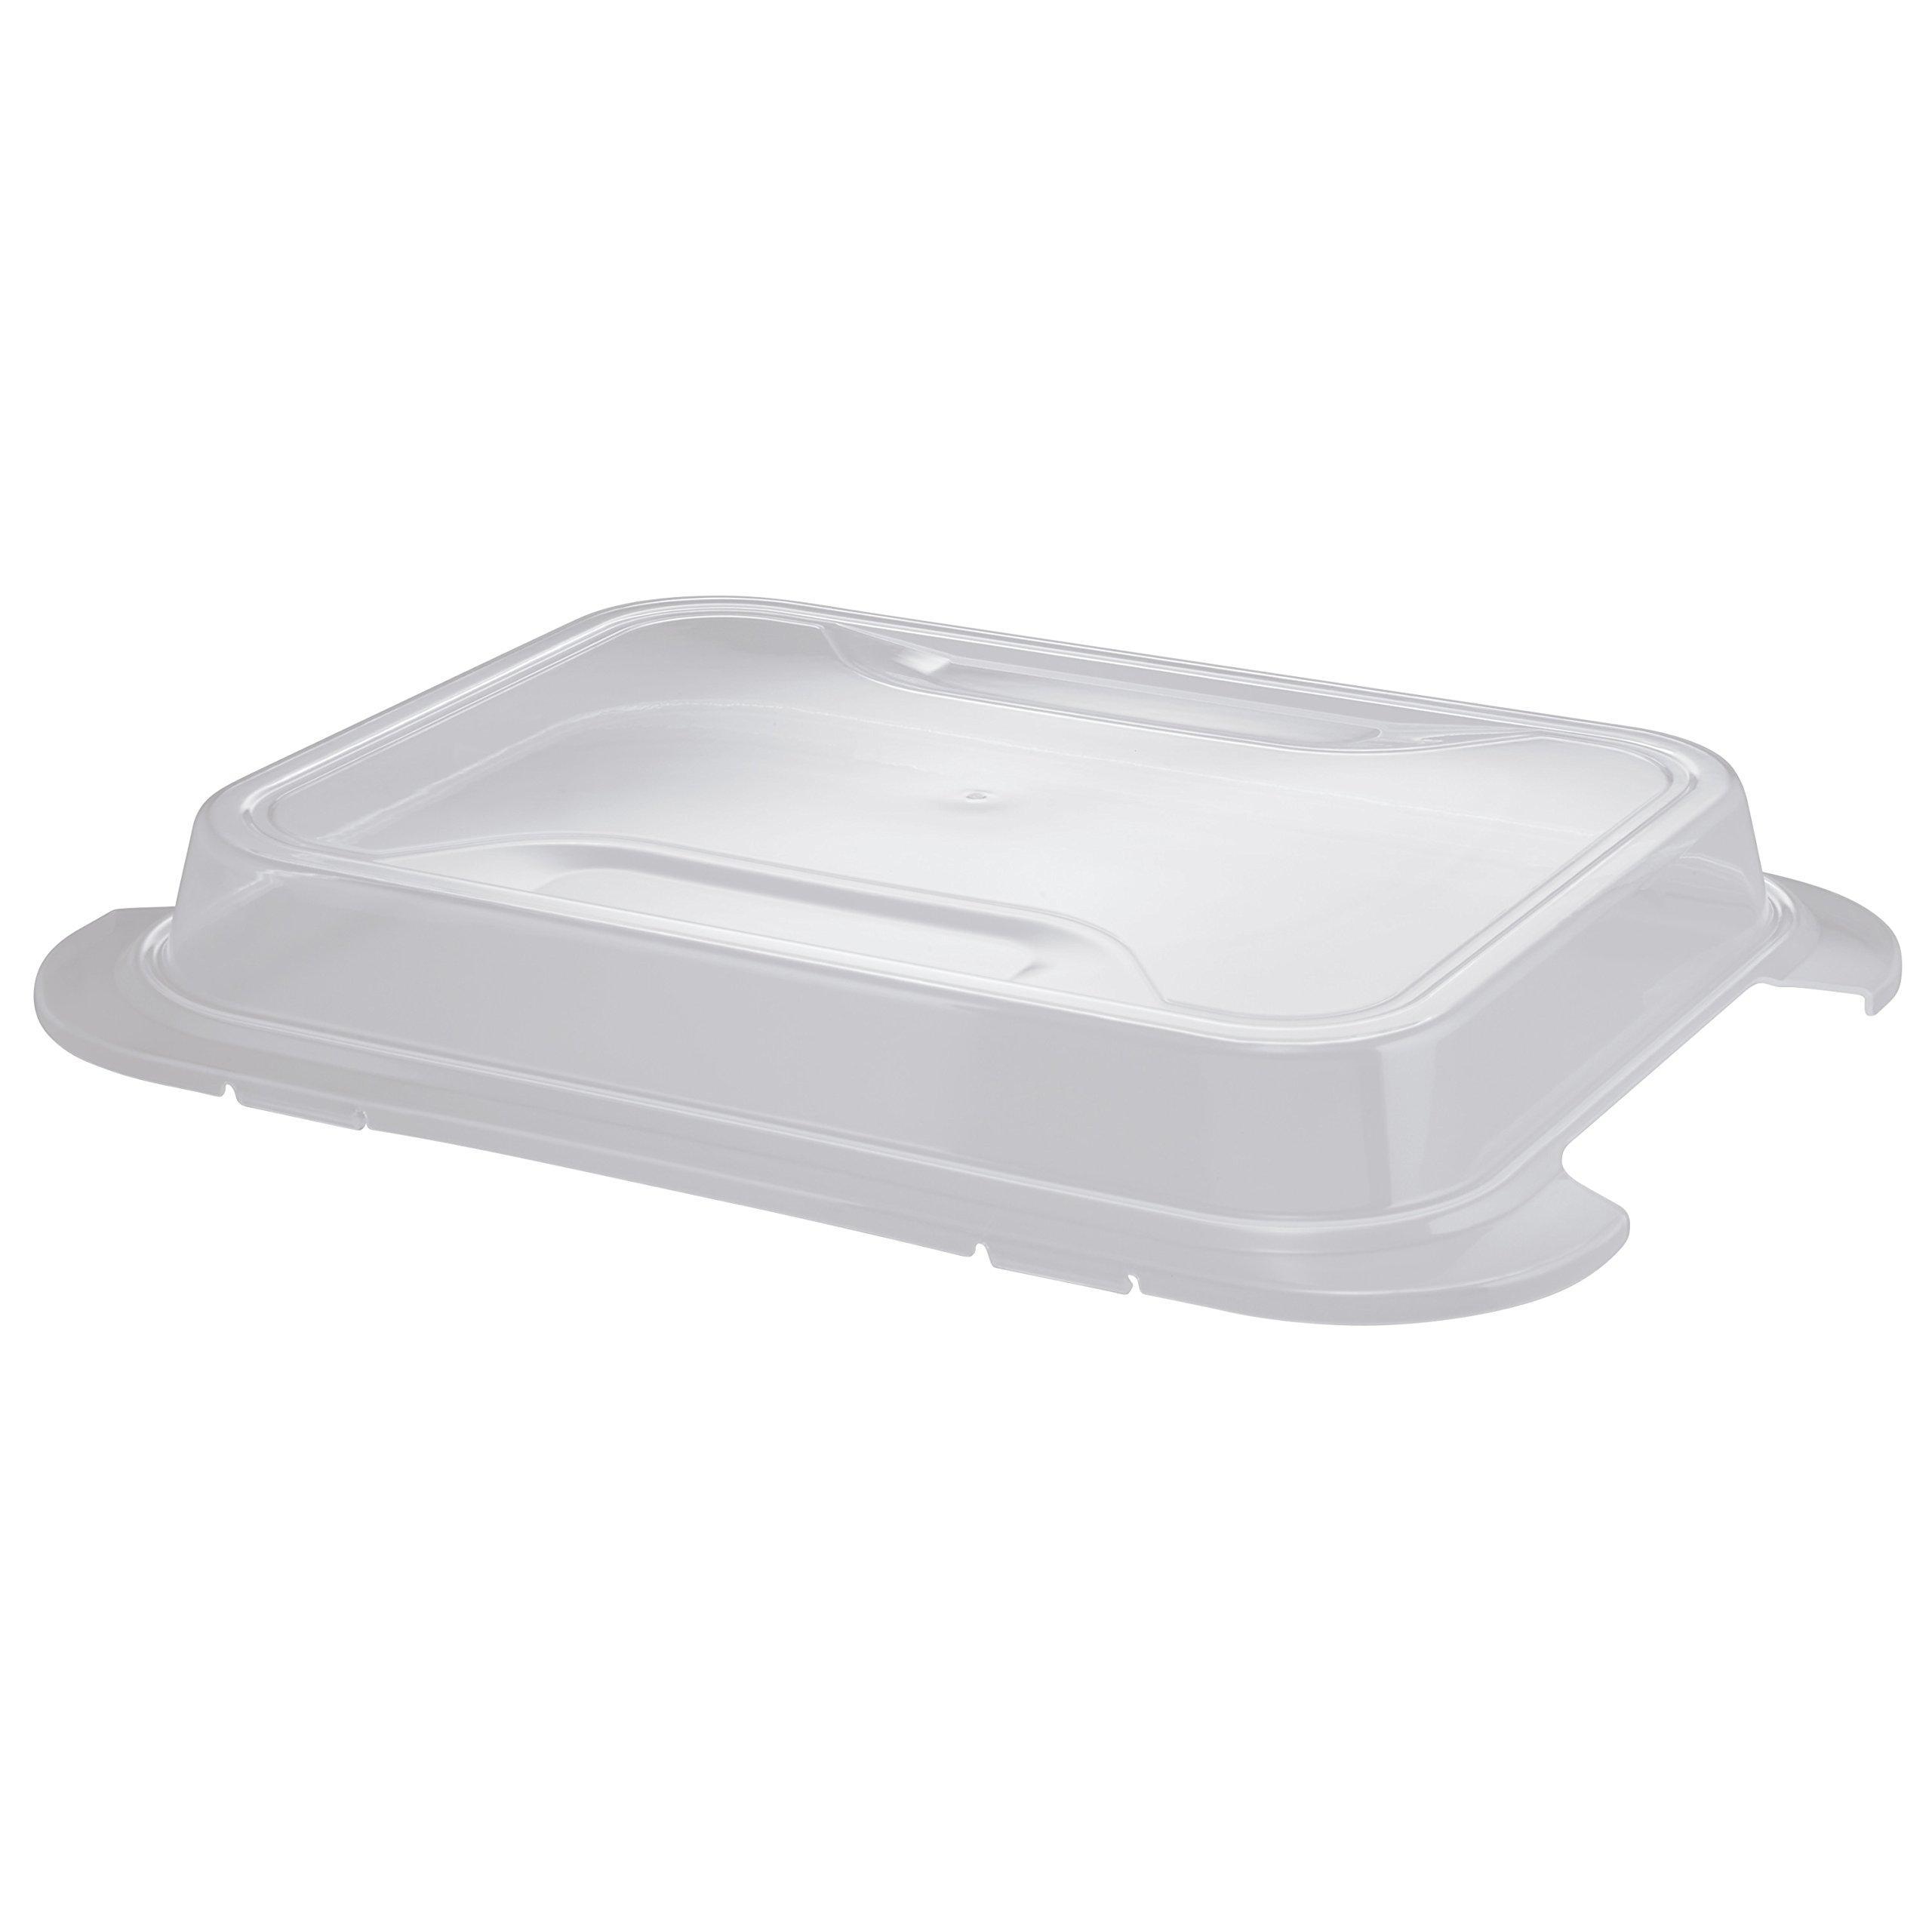 Anolon 46275 3-Piece Steel Bakeware Set, Gray